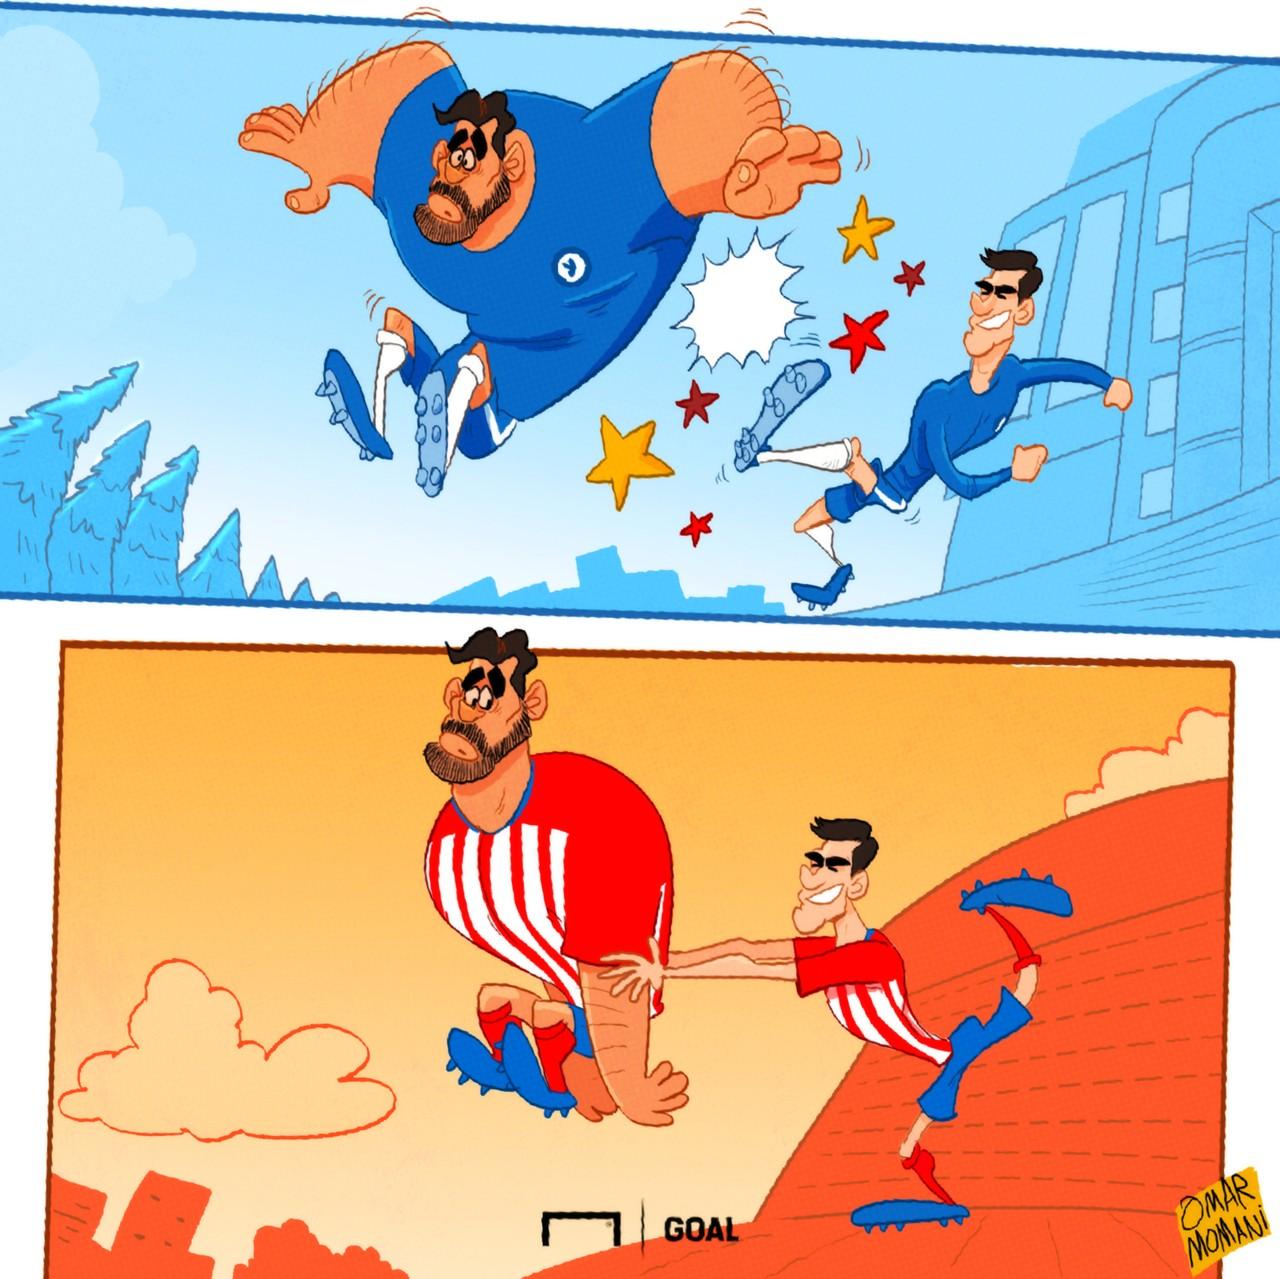 Cartoon Morata Diego Costa - 29012019